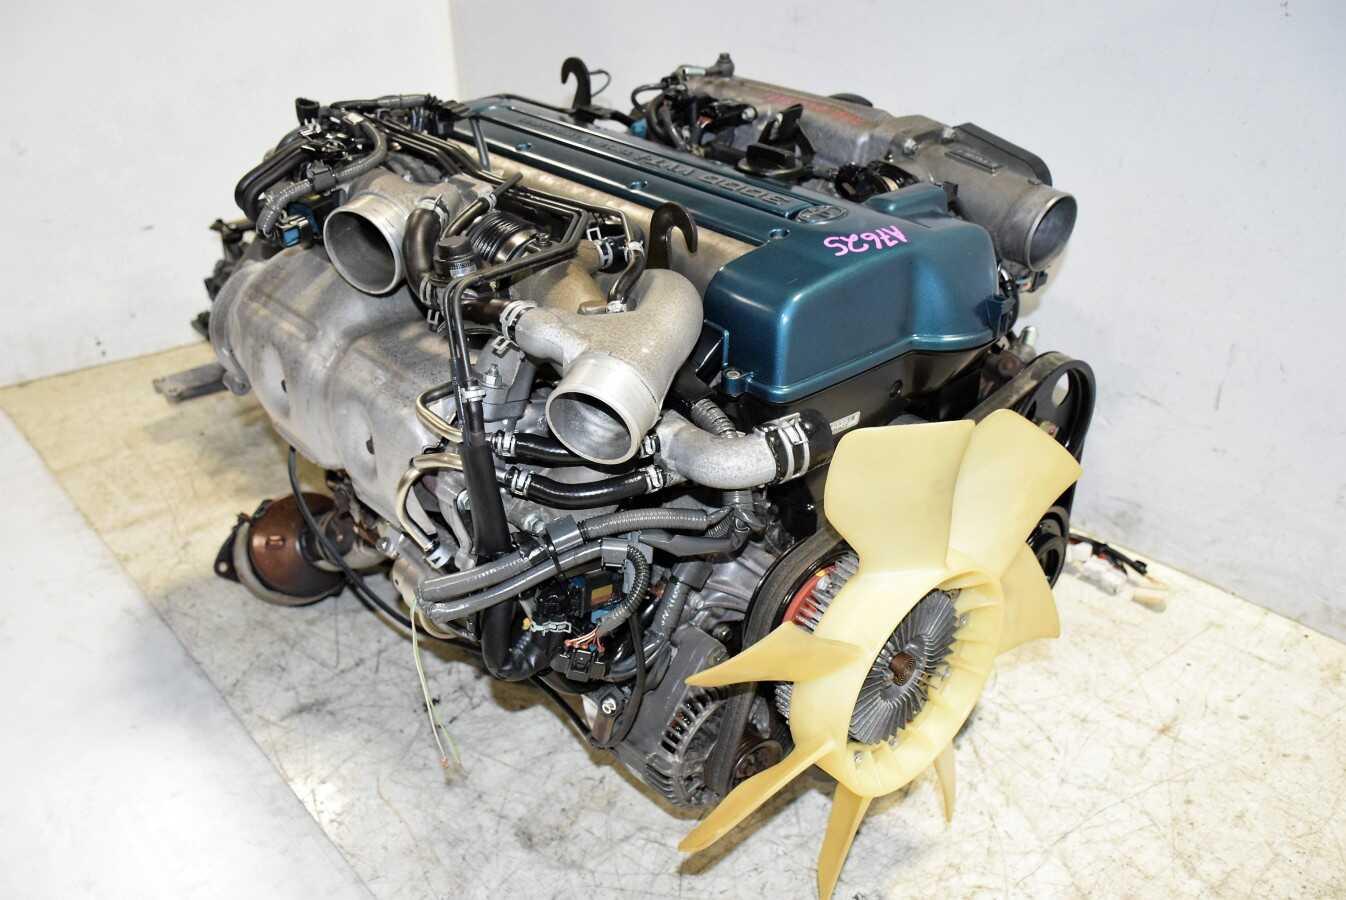 2jz Gte Vvt I Twin Turbo Toyota Supra Engine With V161 6 Speed Wiring Harness Supera 1140 Dsc 0415